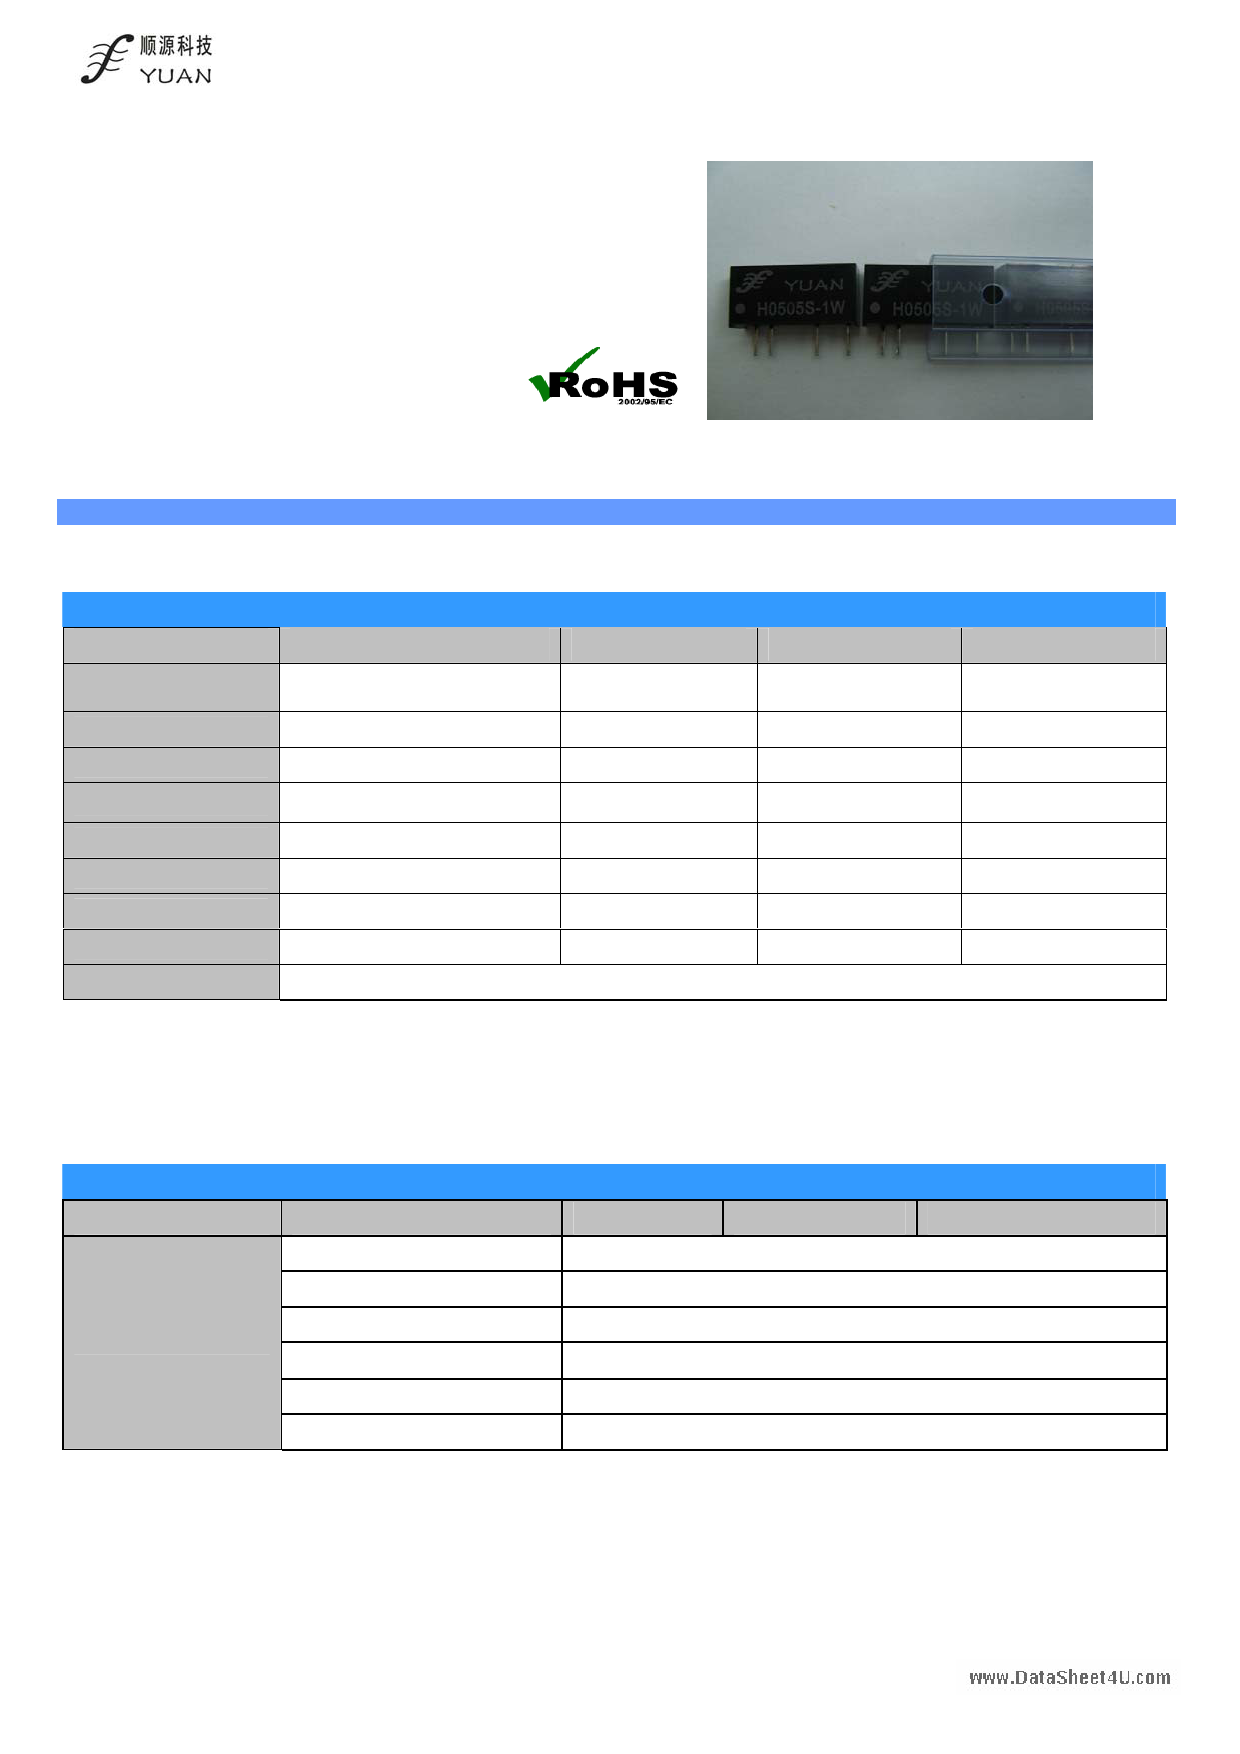 H05xxS-1W datasheet